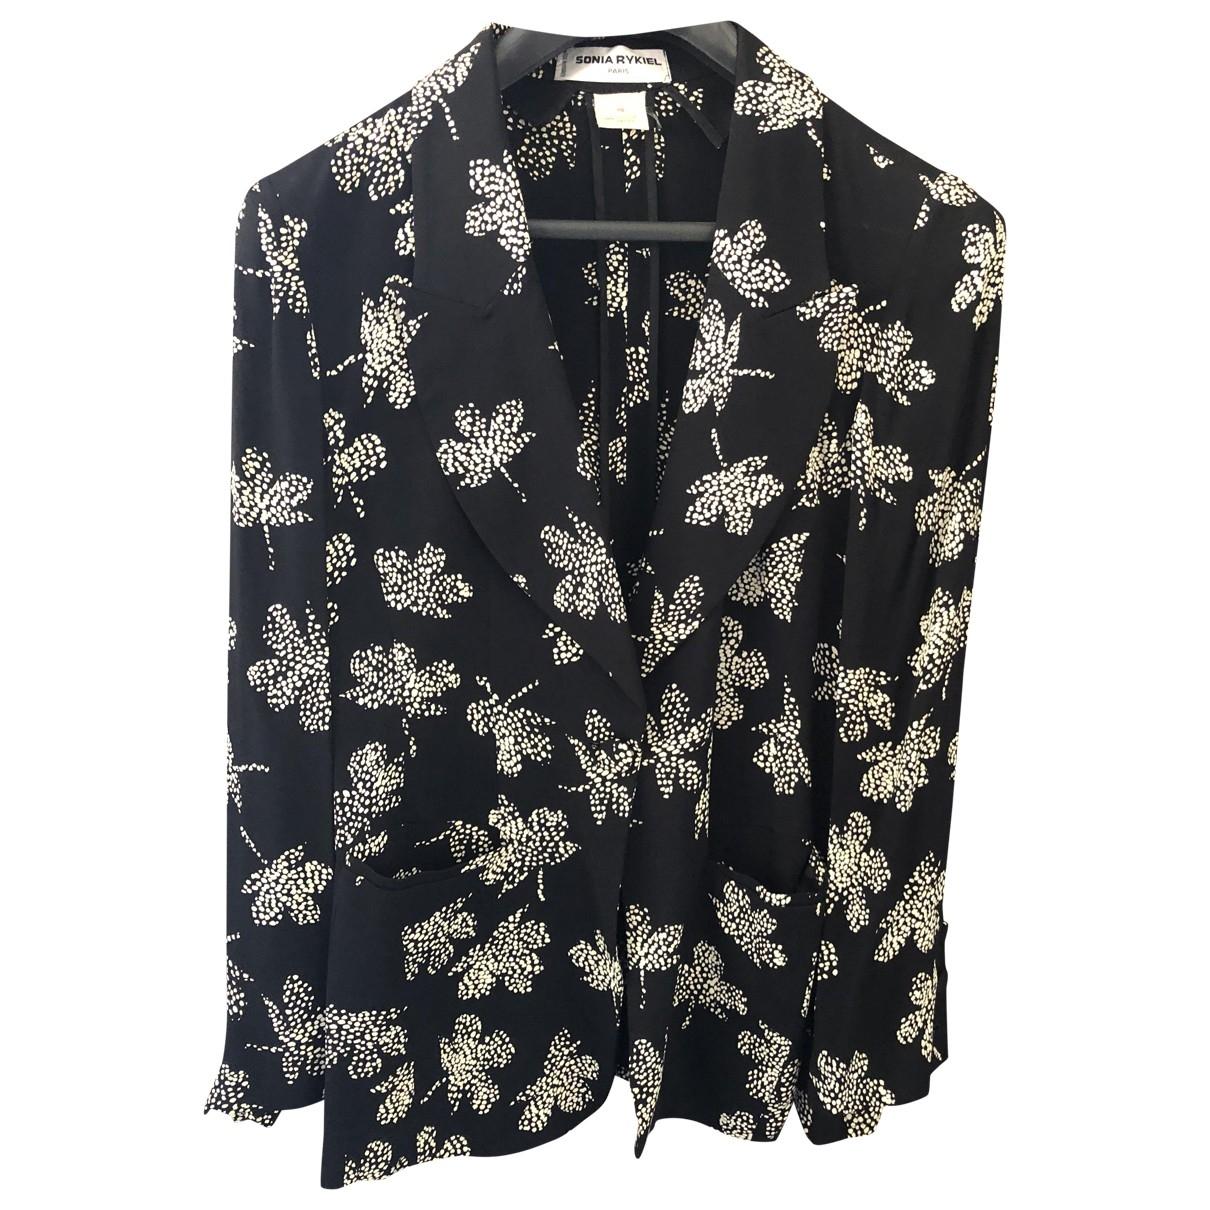 Sonia Rykiel \N Black jacket for Women 40 FR